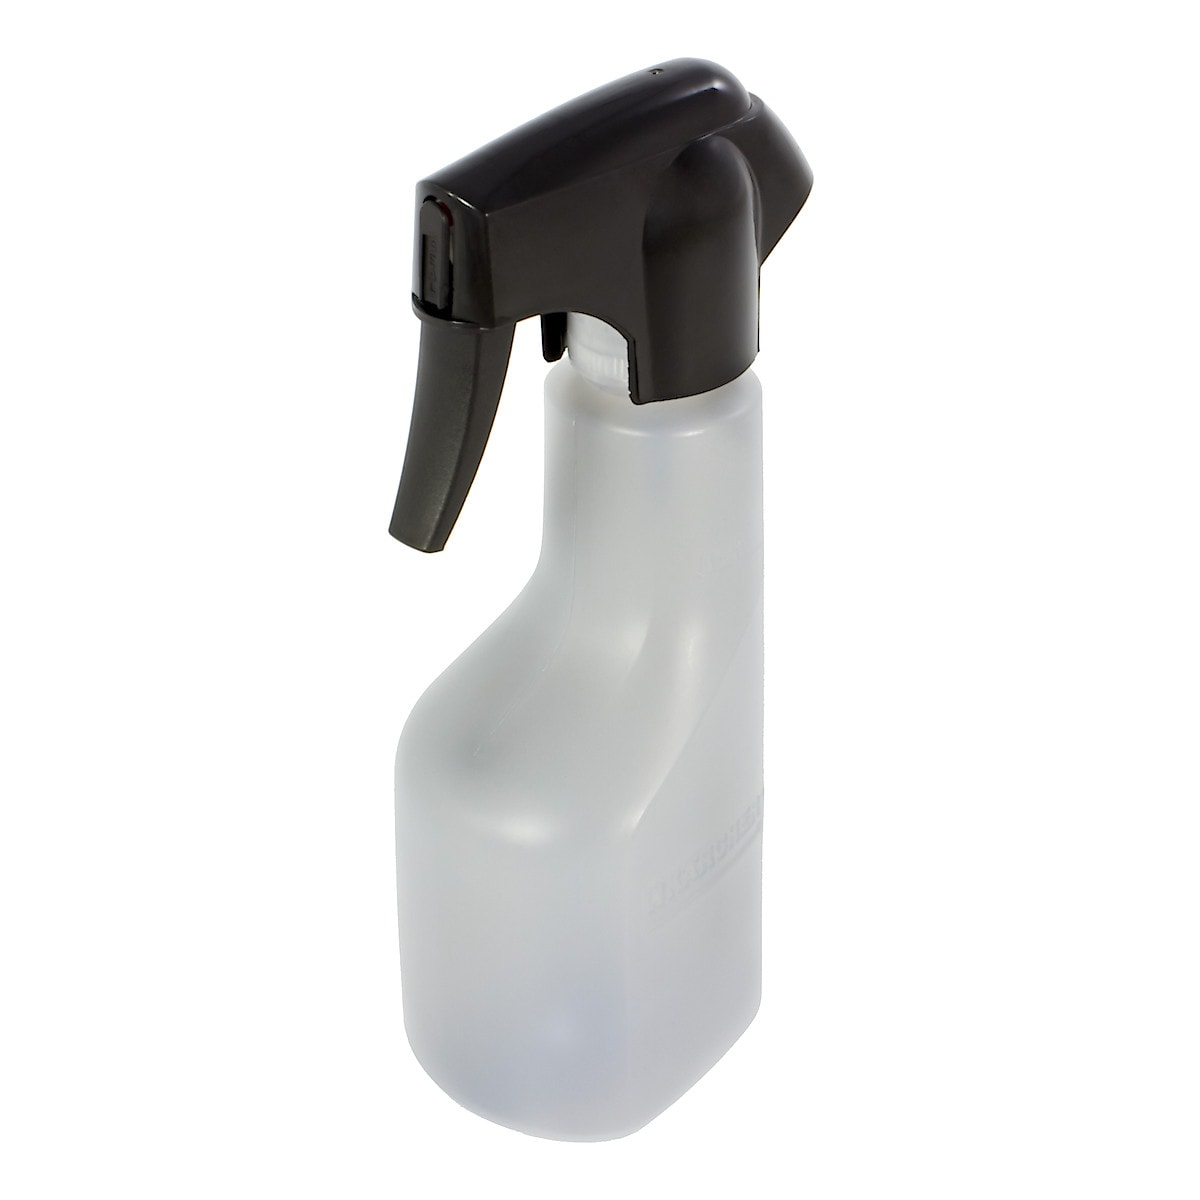 Kärcher sprayflaske til vindusvasker